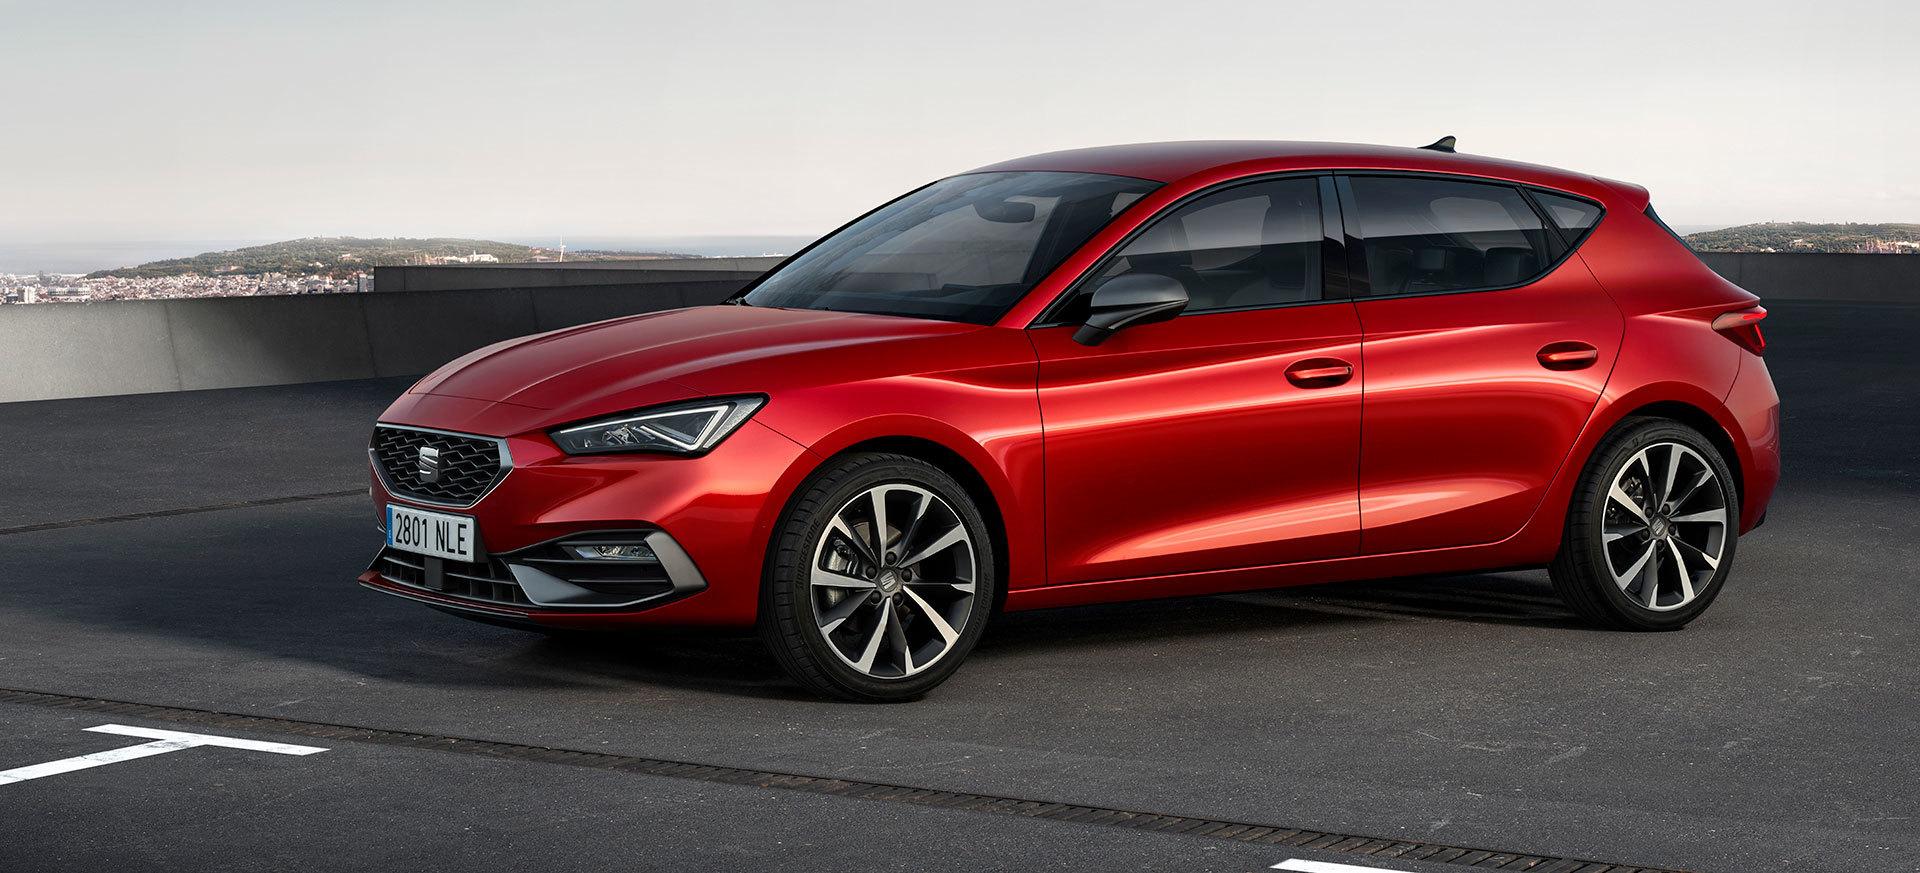 Seat Leon 2020 Fr Rojo 01